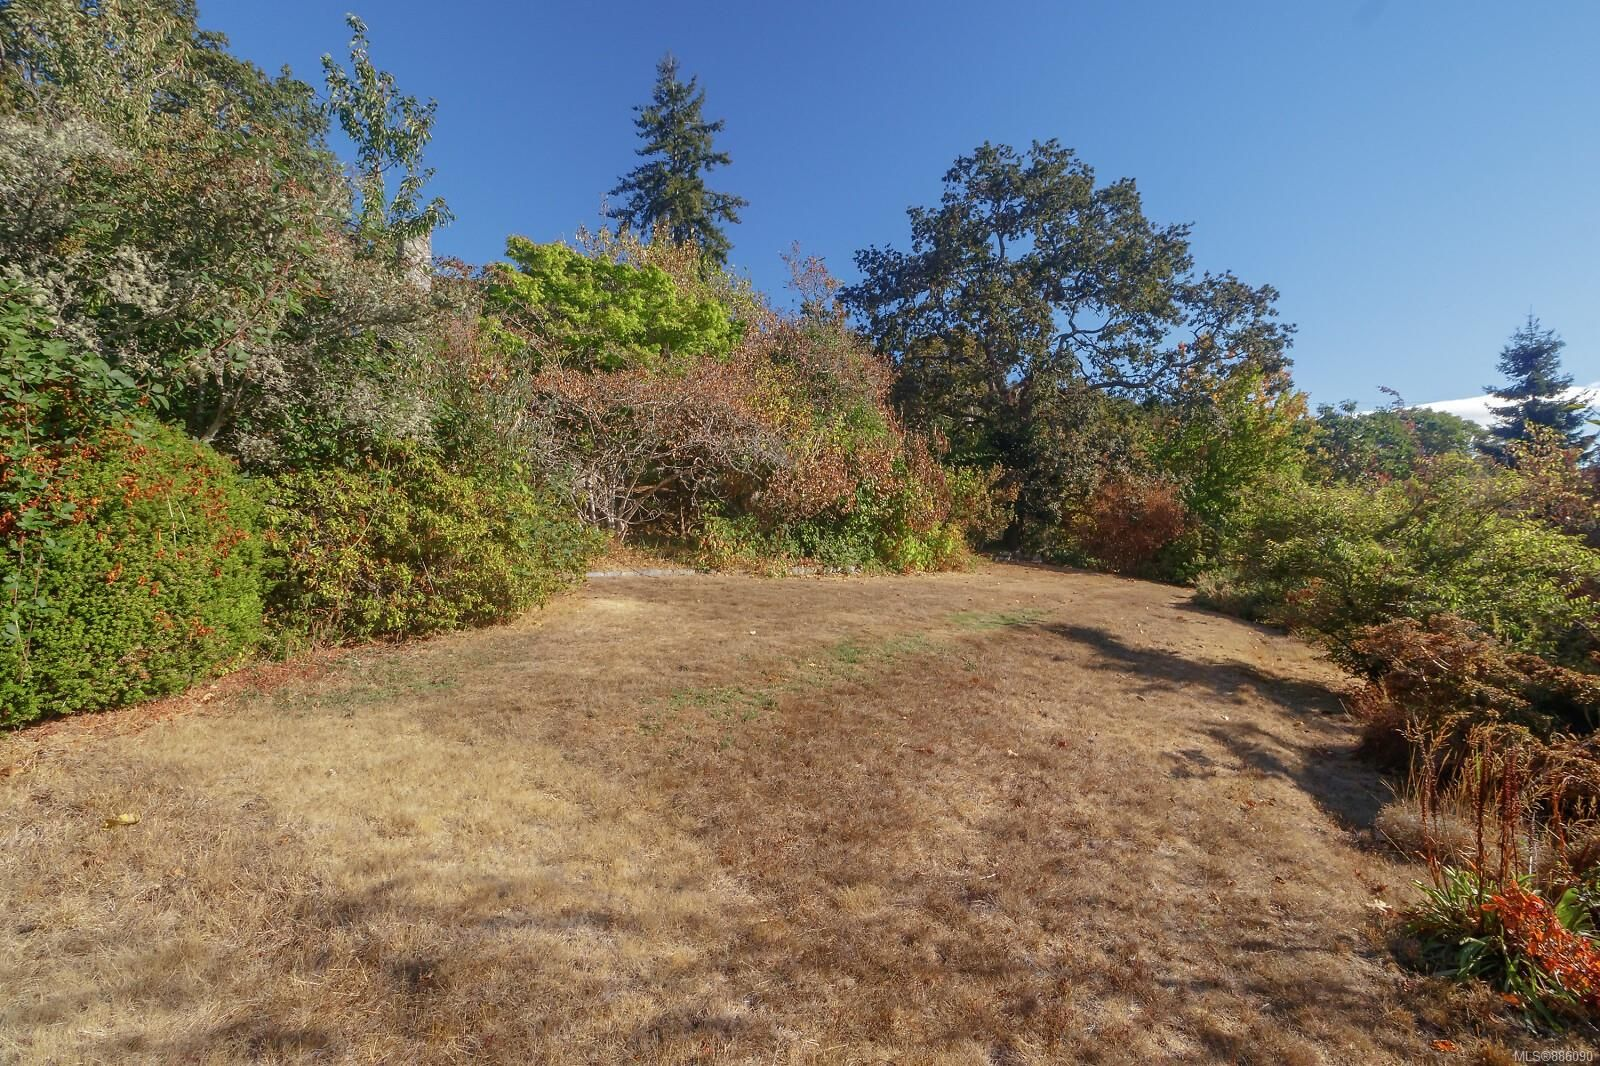 Photo 33: Photos: 4553 Blenkinsop Rd in : SE Blenkinsop House for sale (Saanich East)  : MLS®# 886090